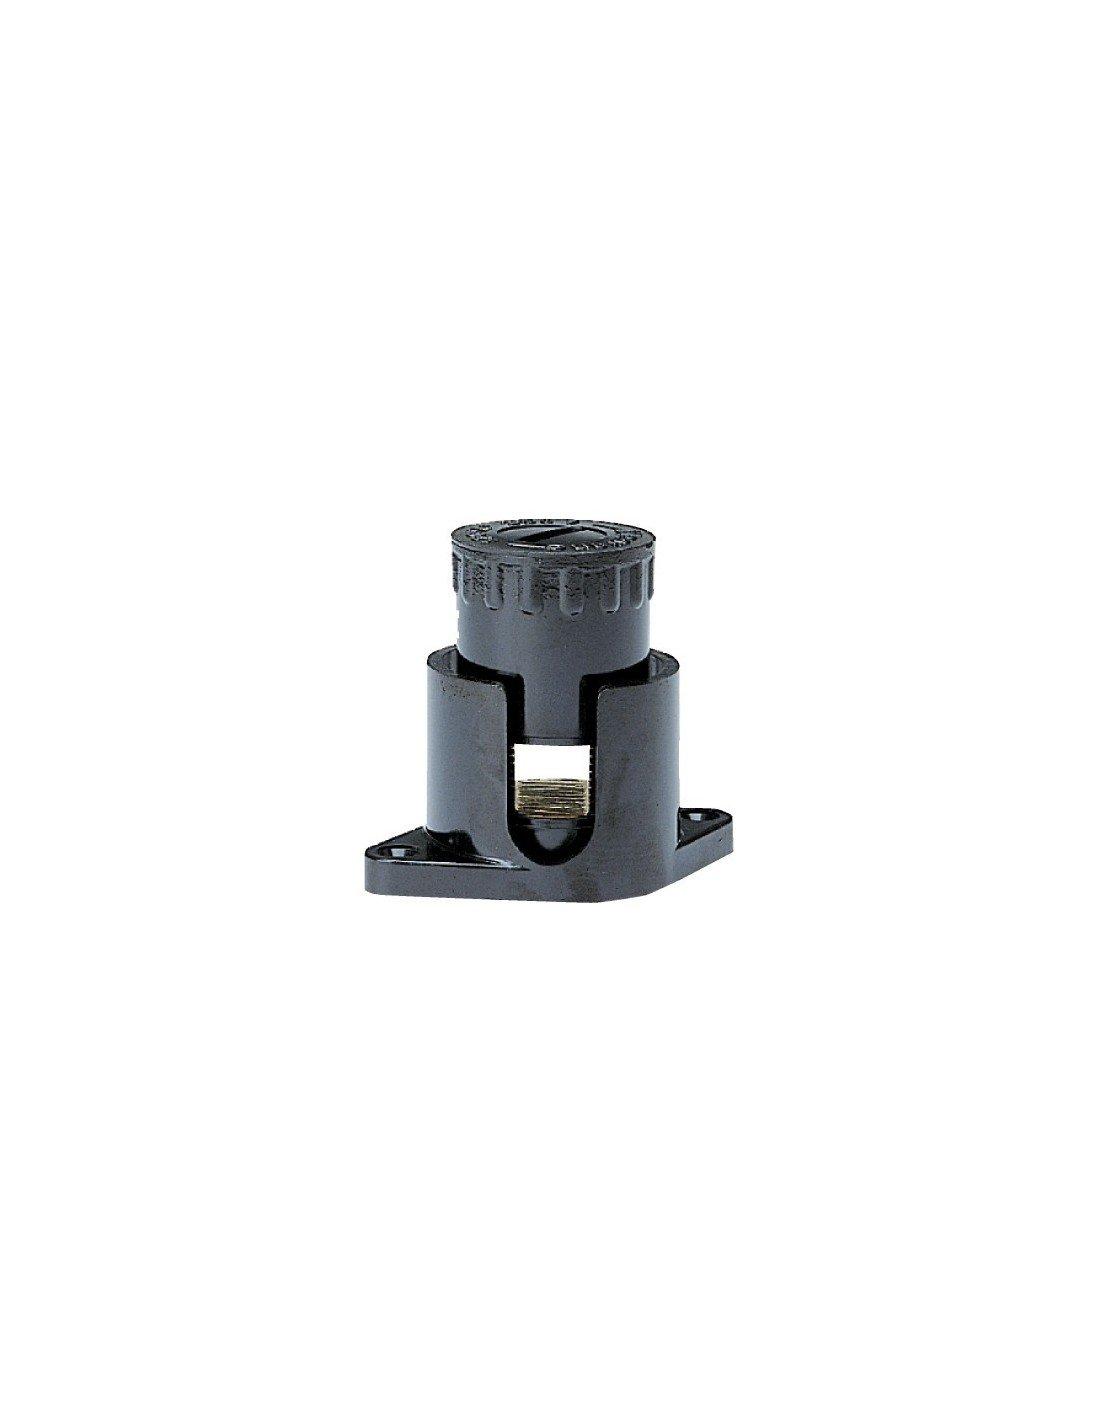 Legrand LEG34043 - Bornas anti-cizalla, 6 lados, 2 x 30 30 mm² 2 x 30 30 mm²